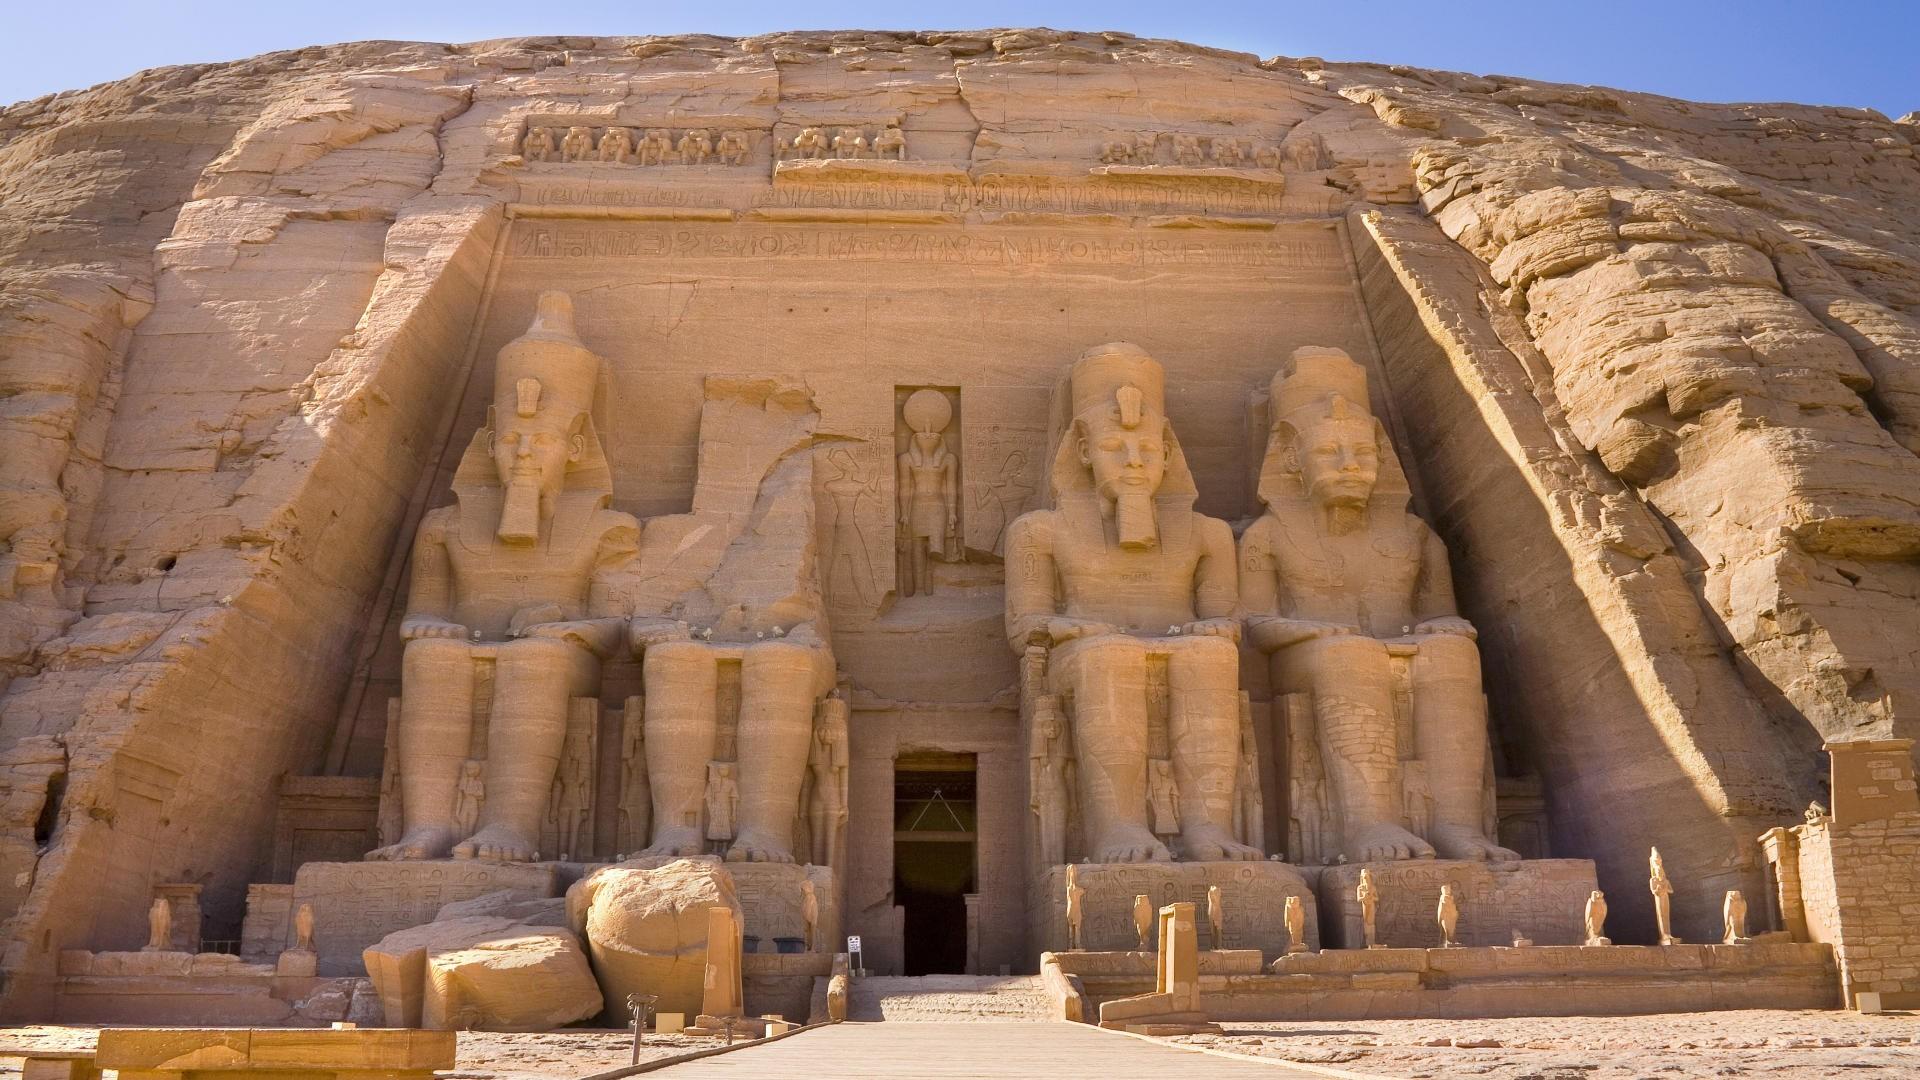 General 1920x1080 Abu Simbel temple Egypt